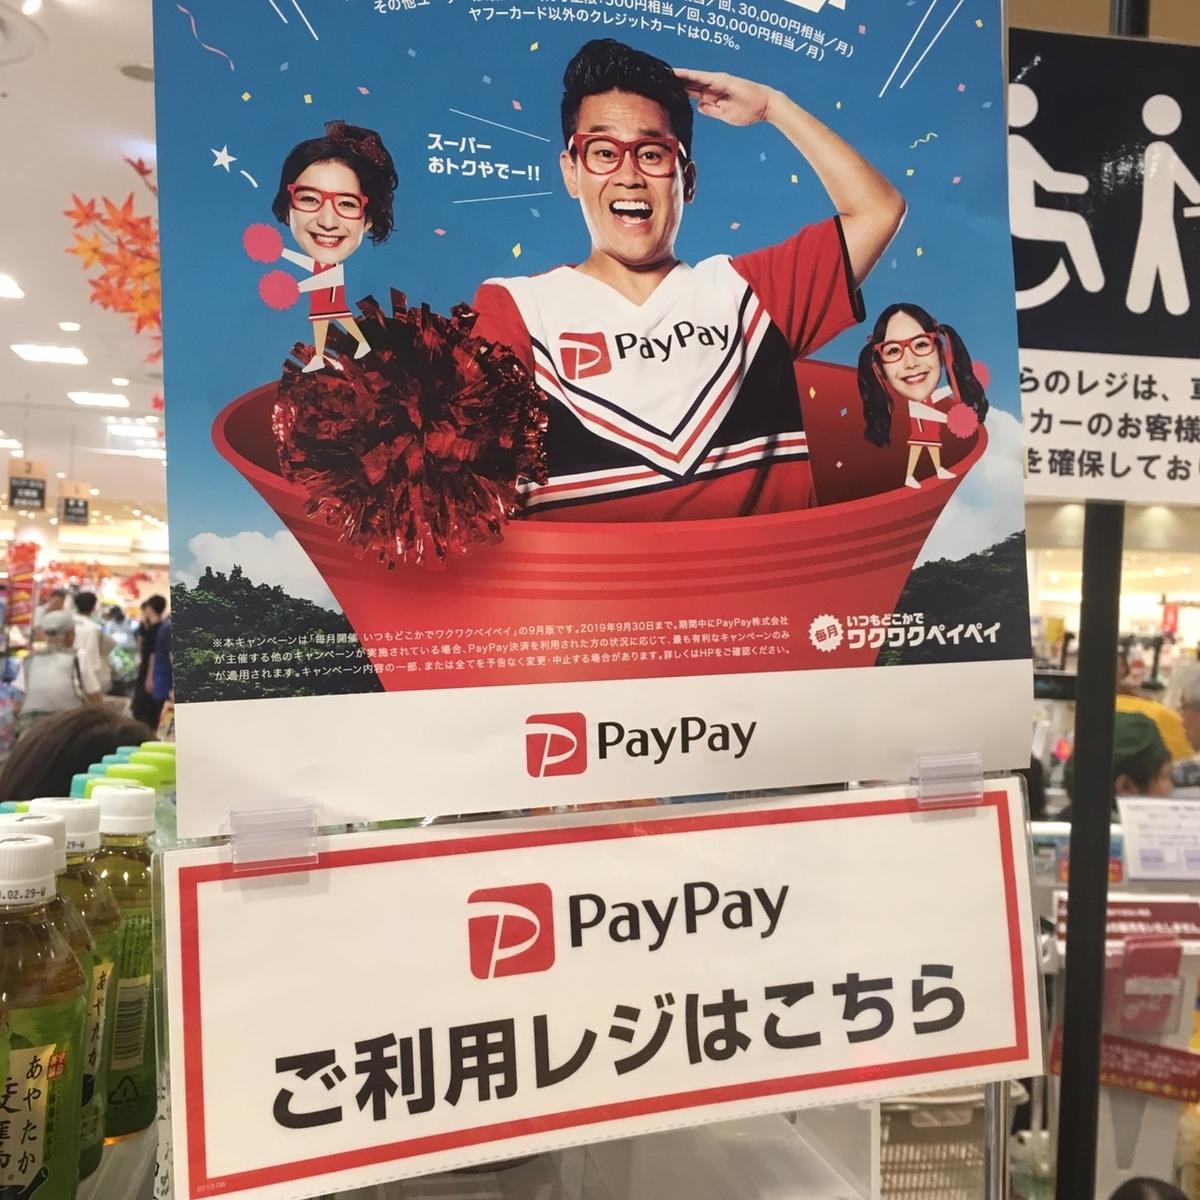 f:id:kiyoshi_net:20190901142602j:plain